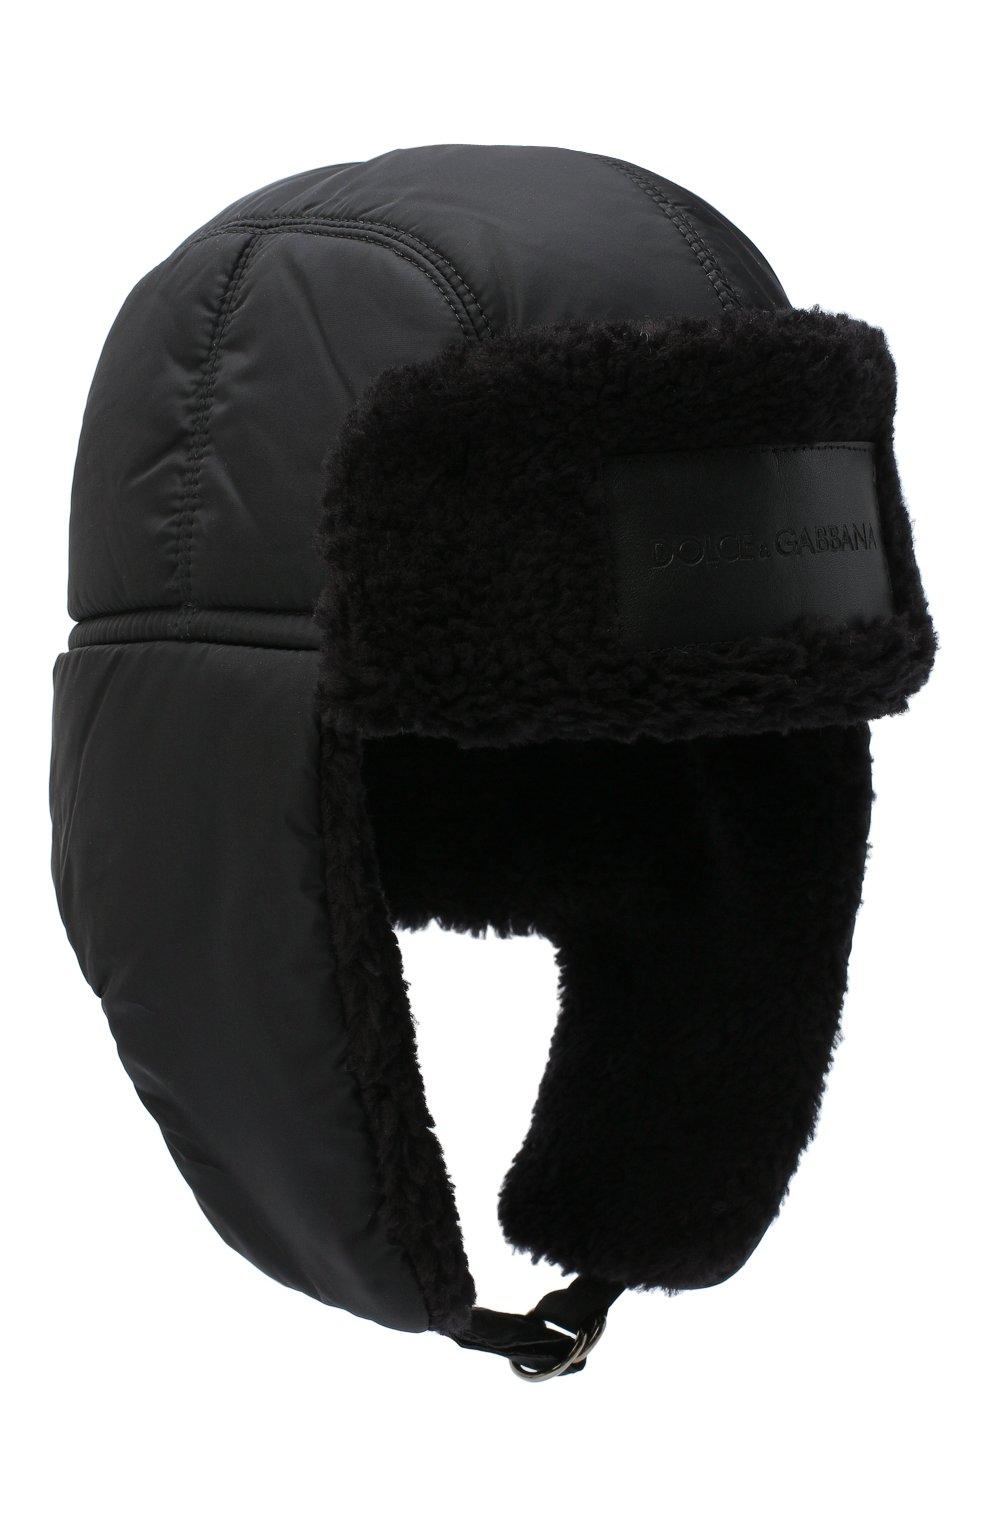 Мужская утепленная шапка-ушанка DOLCE & GABBANA черного цвета, арт. GH574Z/FUMQG | Фото 1